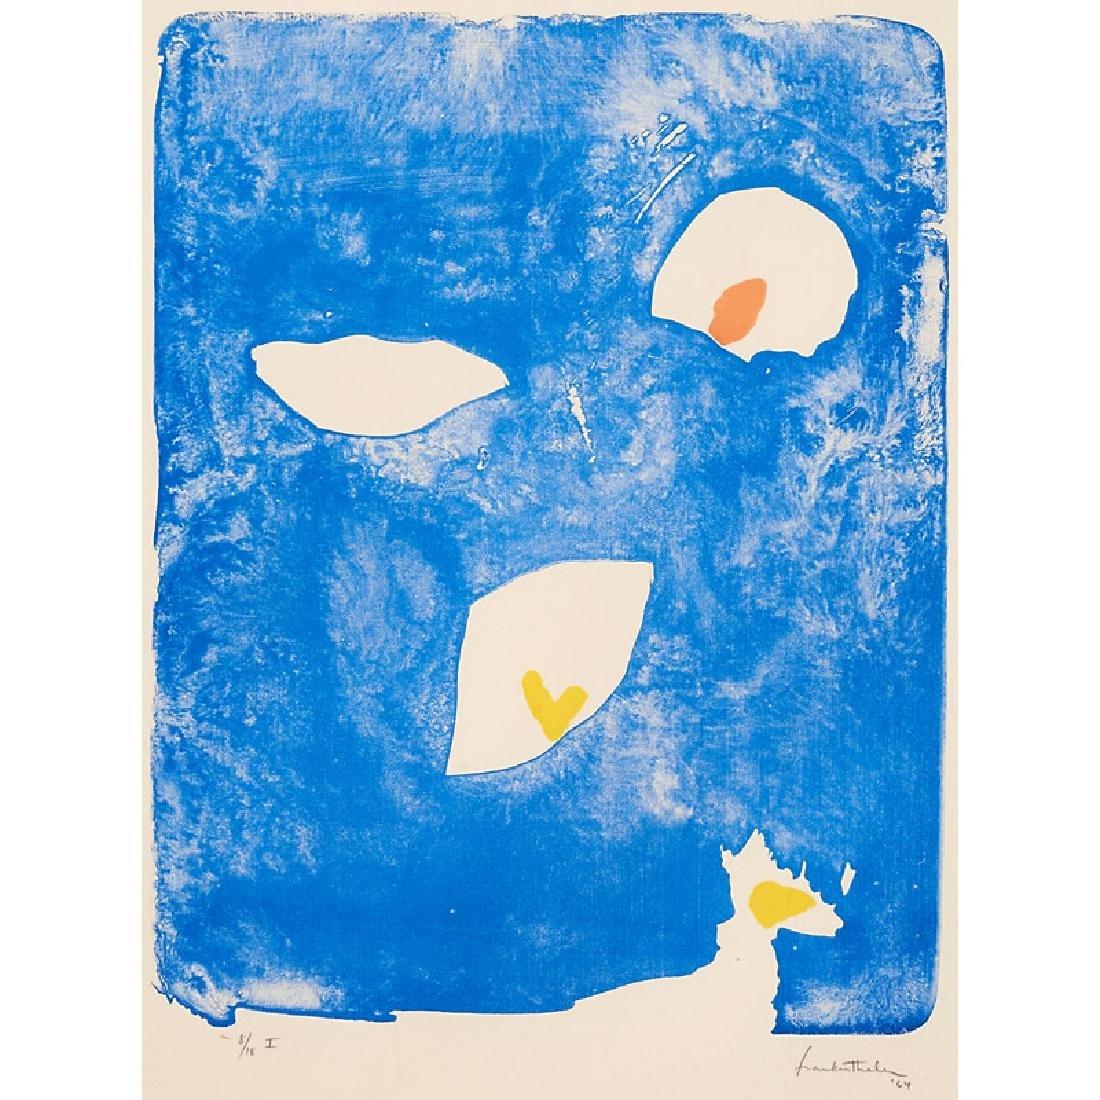 Helen Frankenthaler (American, 1928-2011)